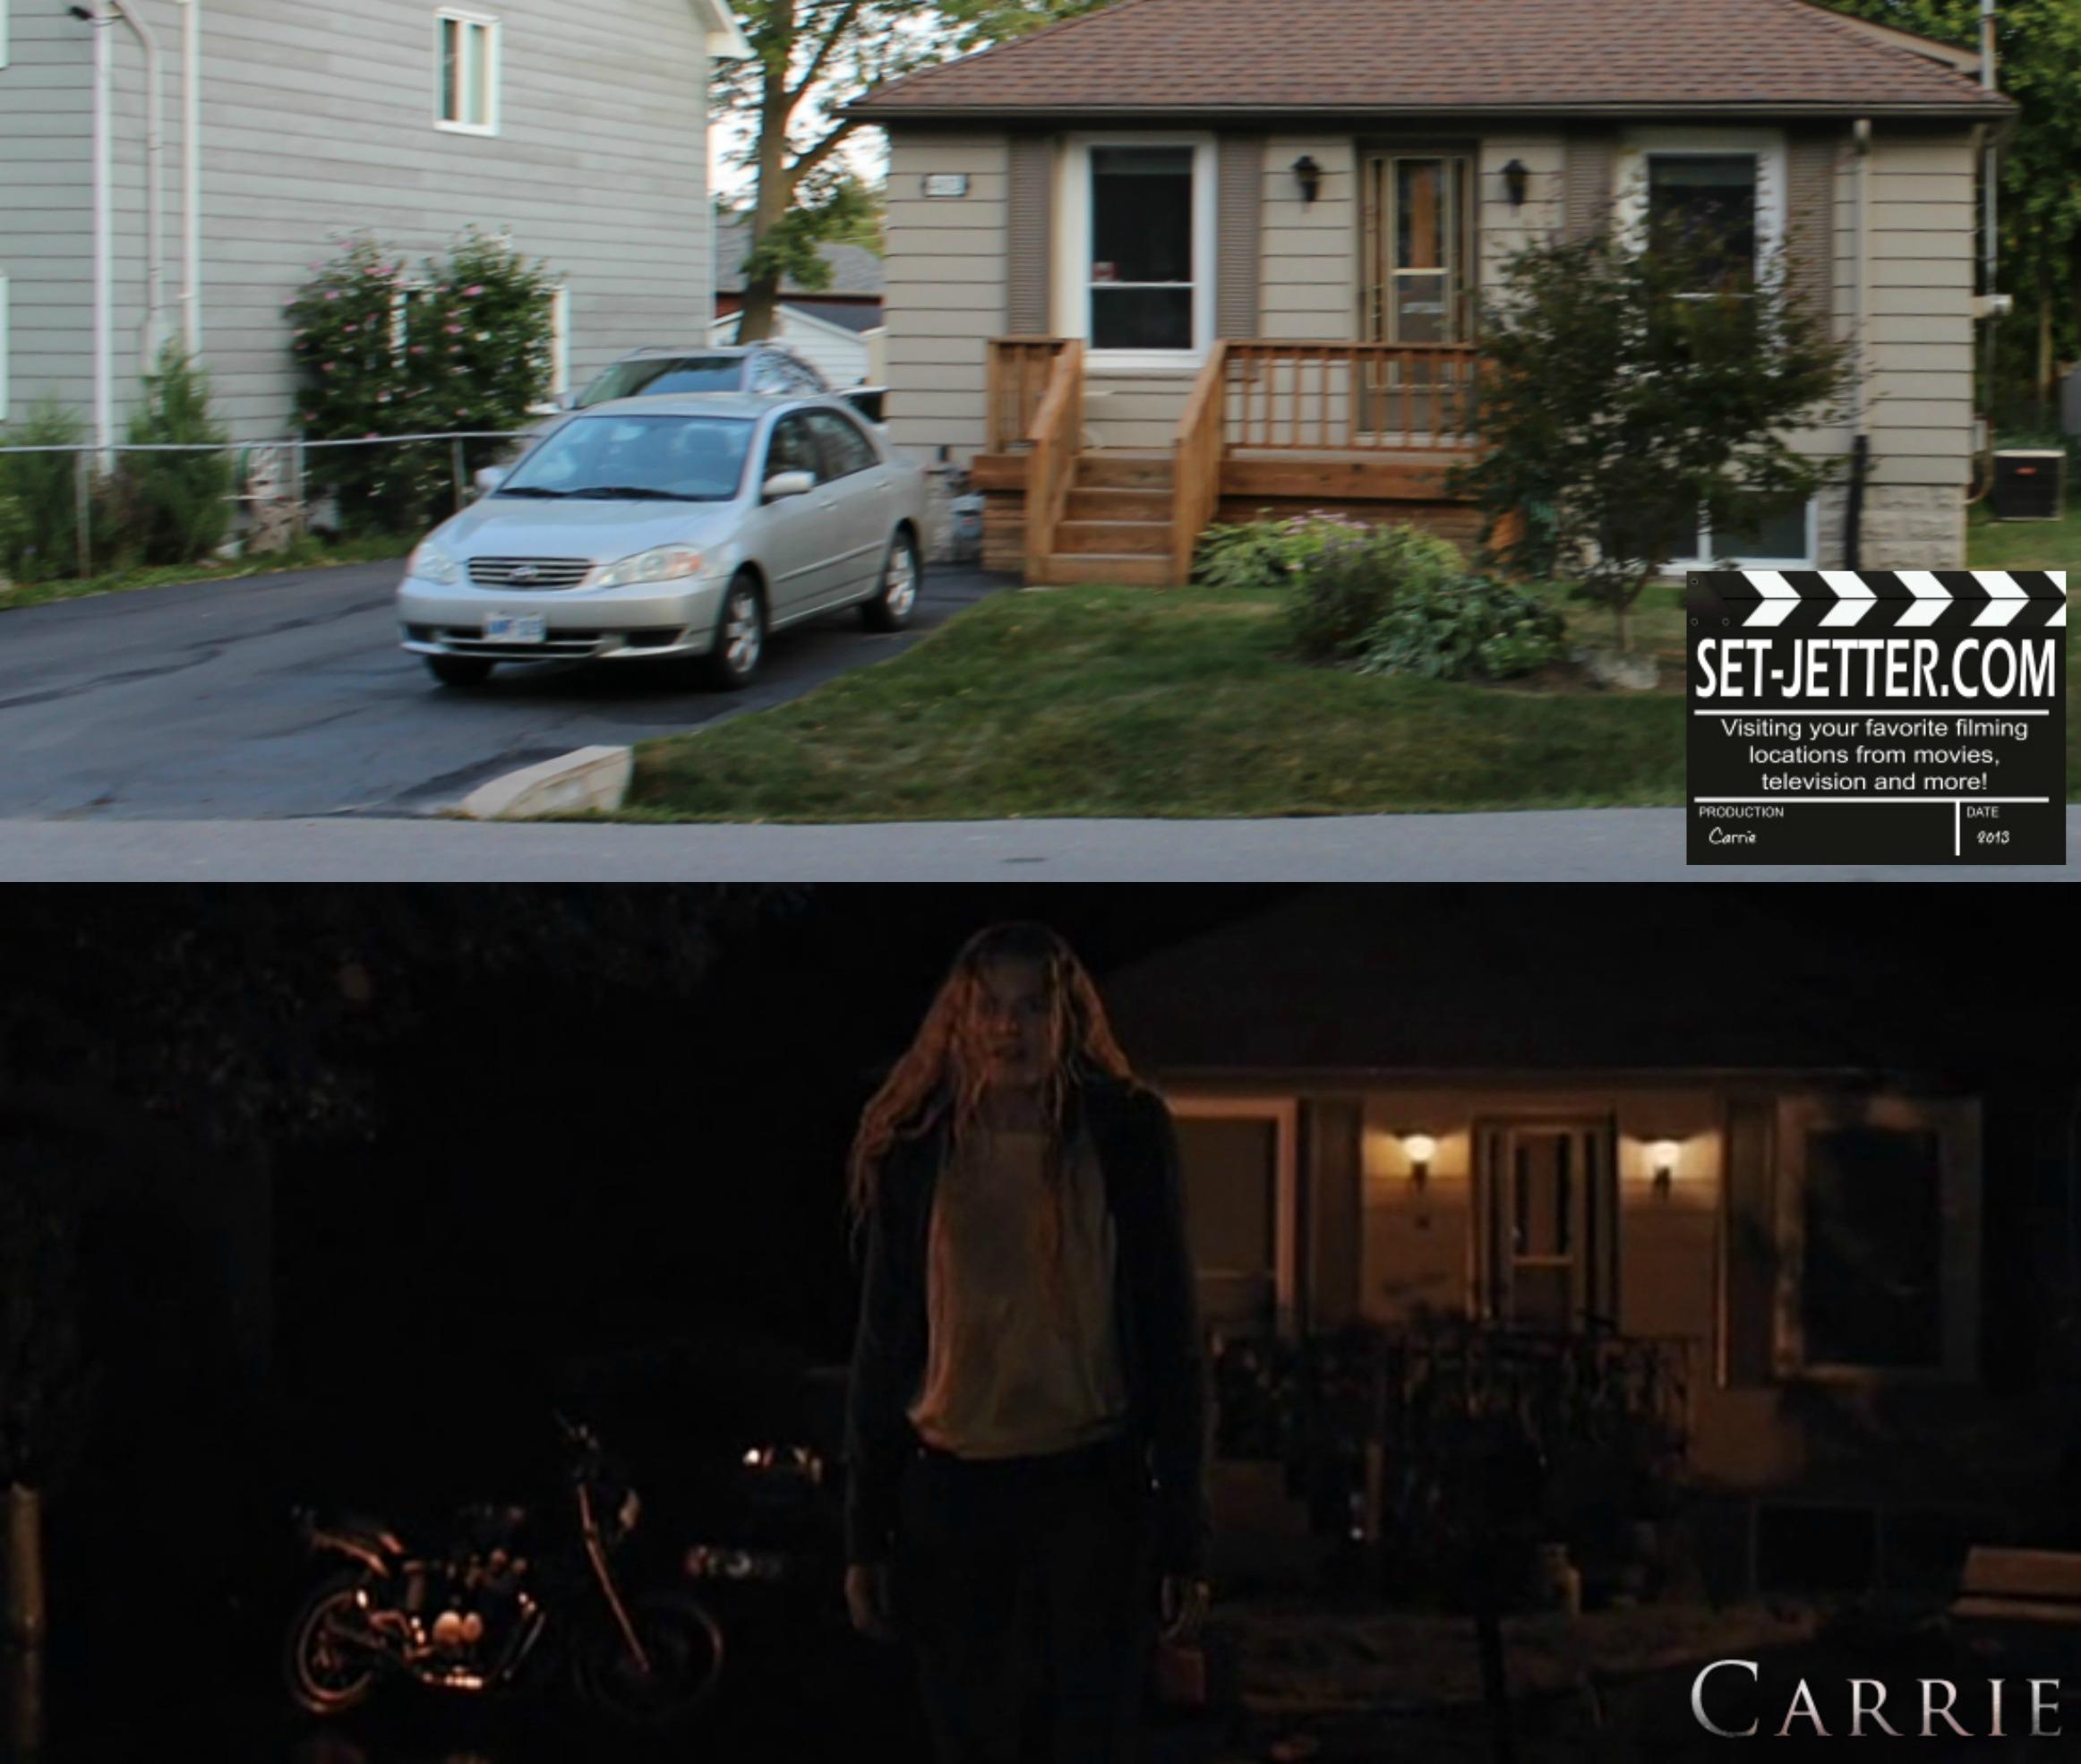 Carrie 2013 comparison 57.jpg